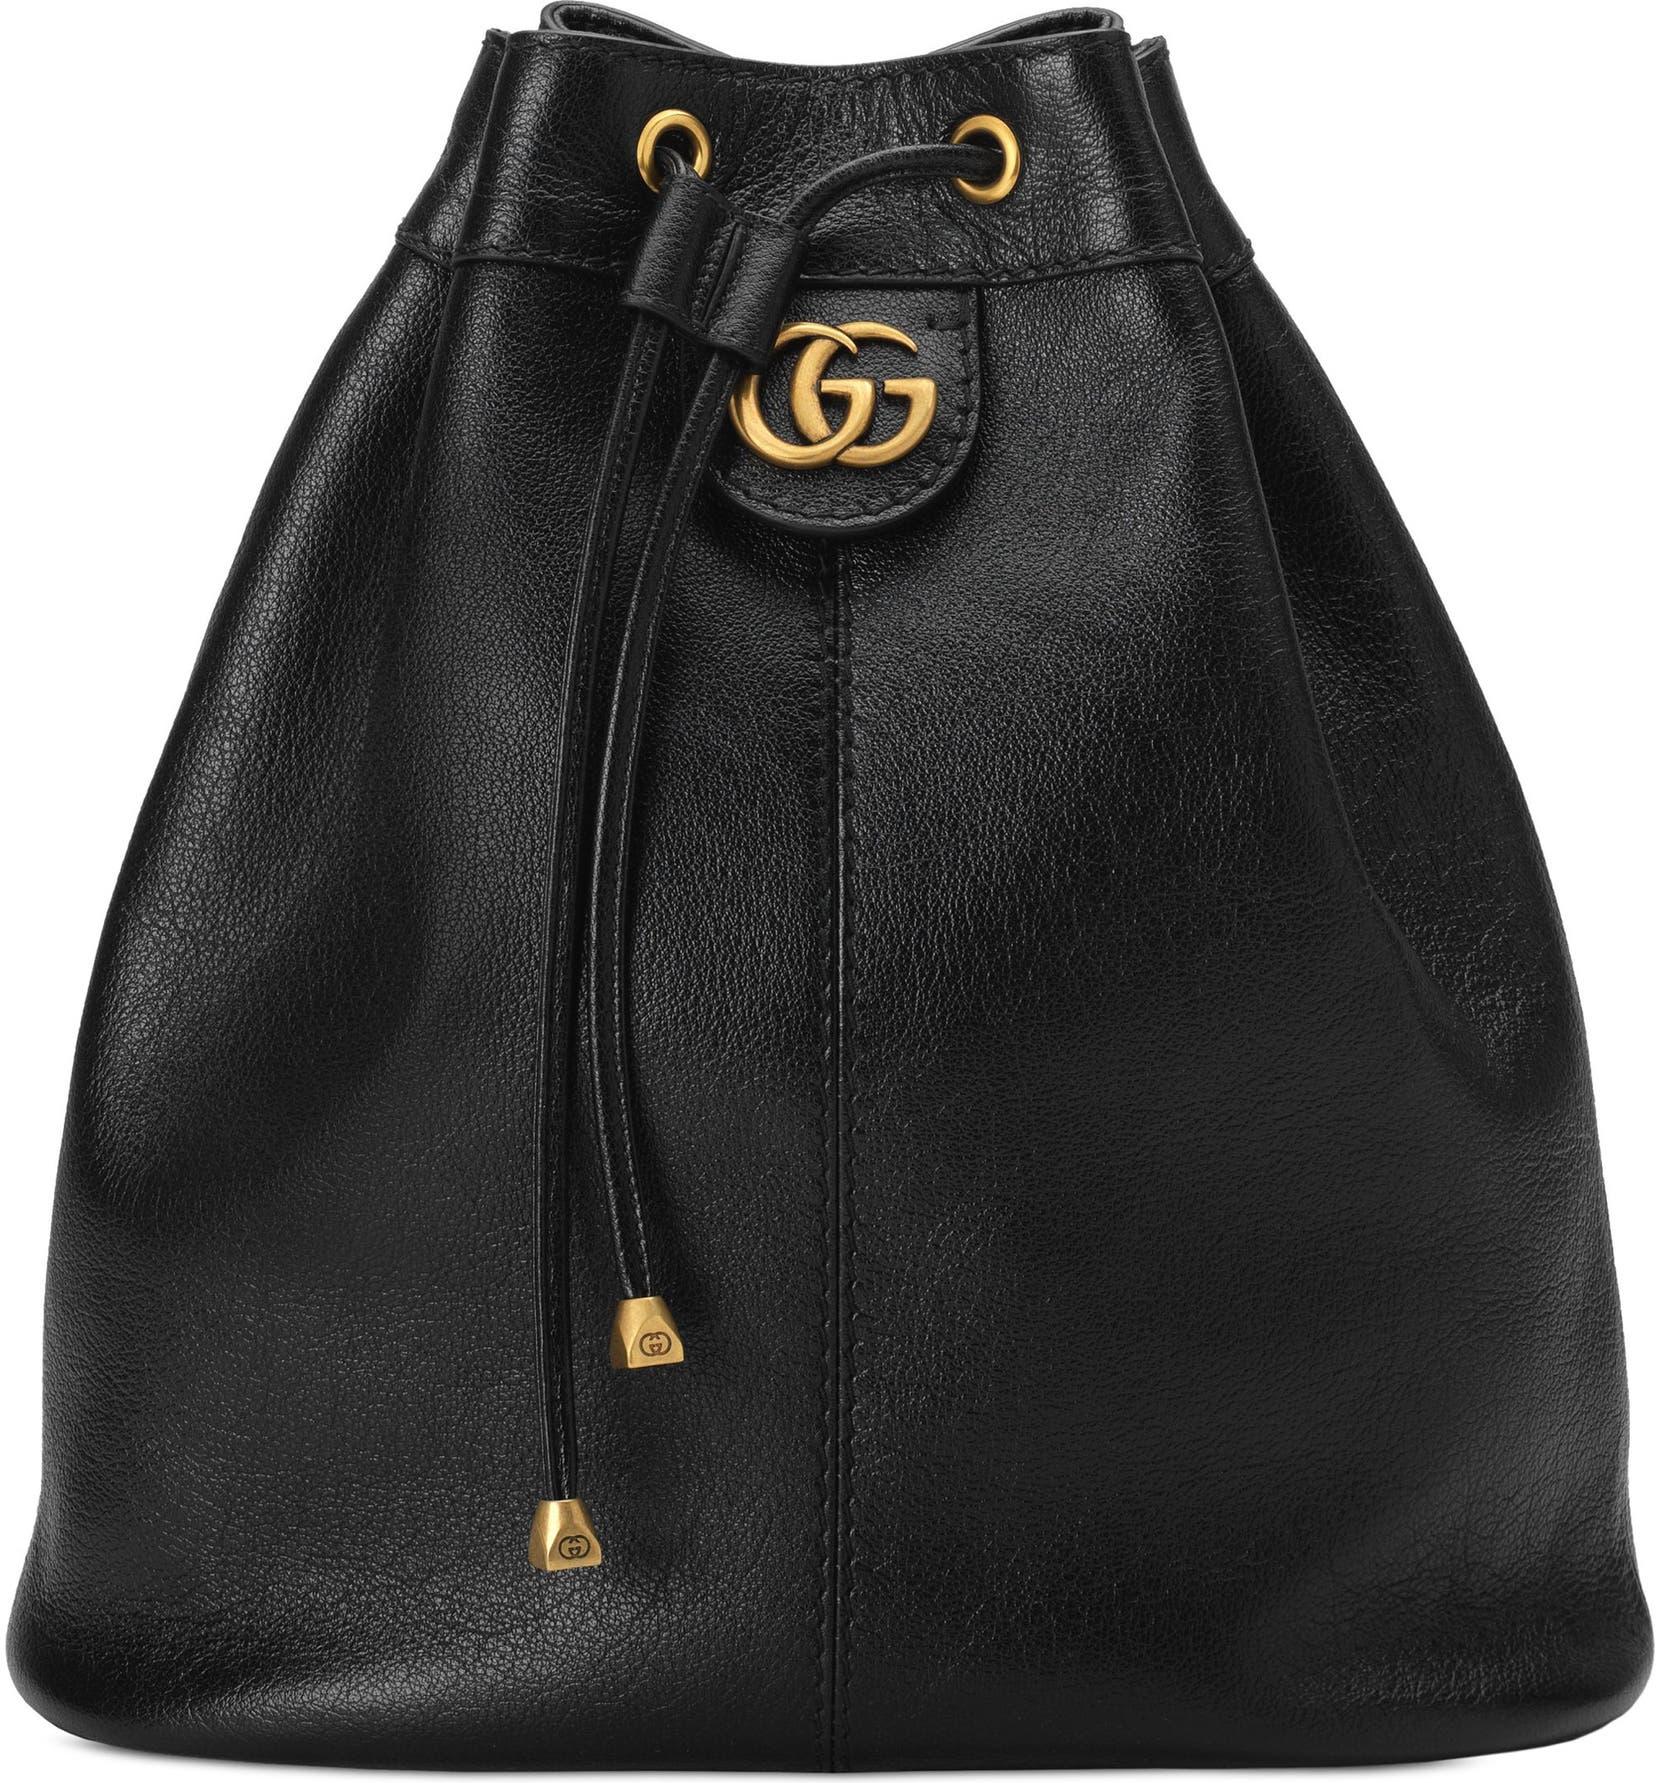 afbd8b5d8c0d Gucci Medium RE(BELLE) Leather Convertible Bucket Bag | Nordstrom